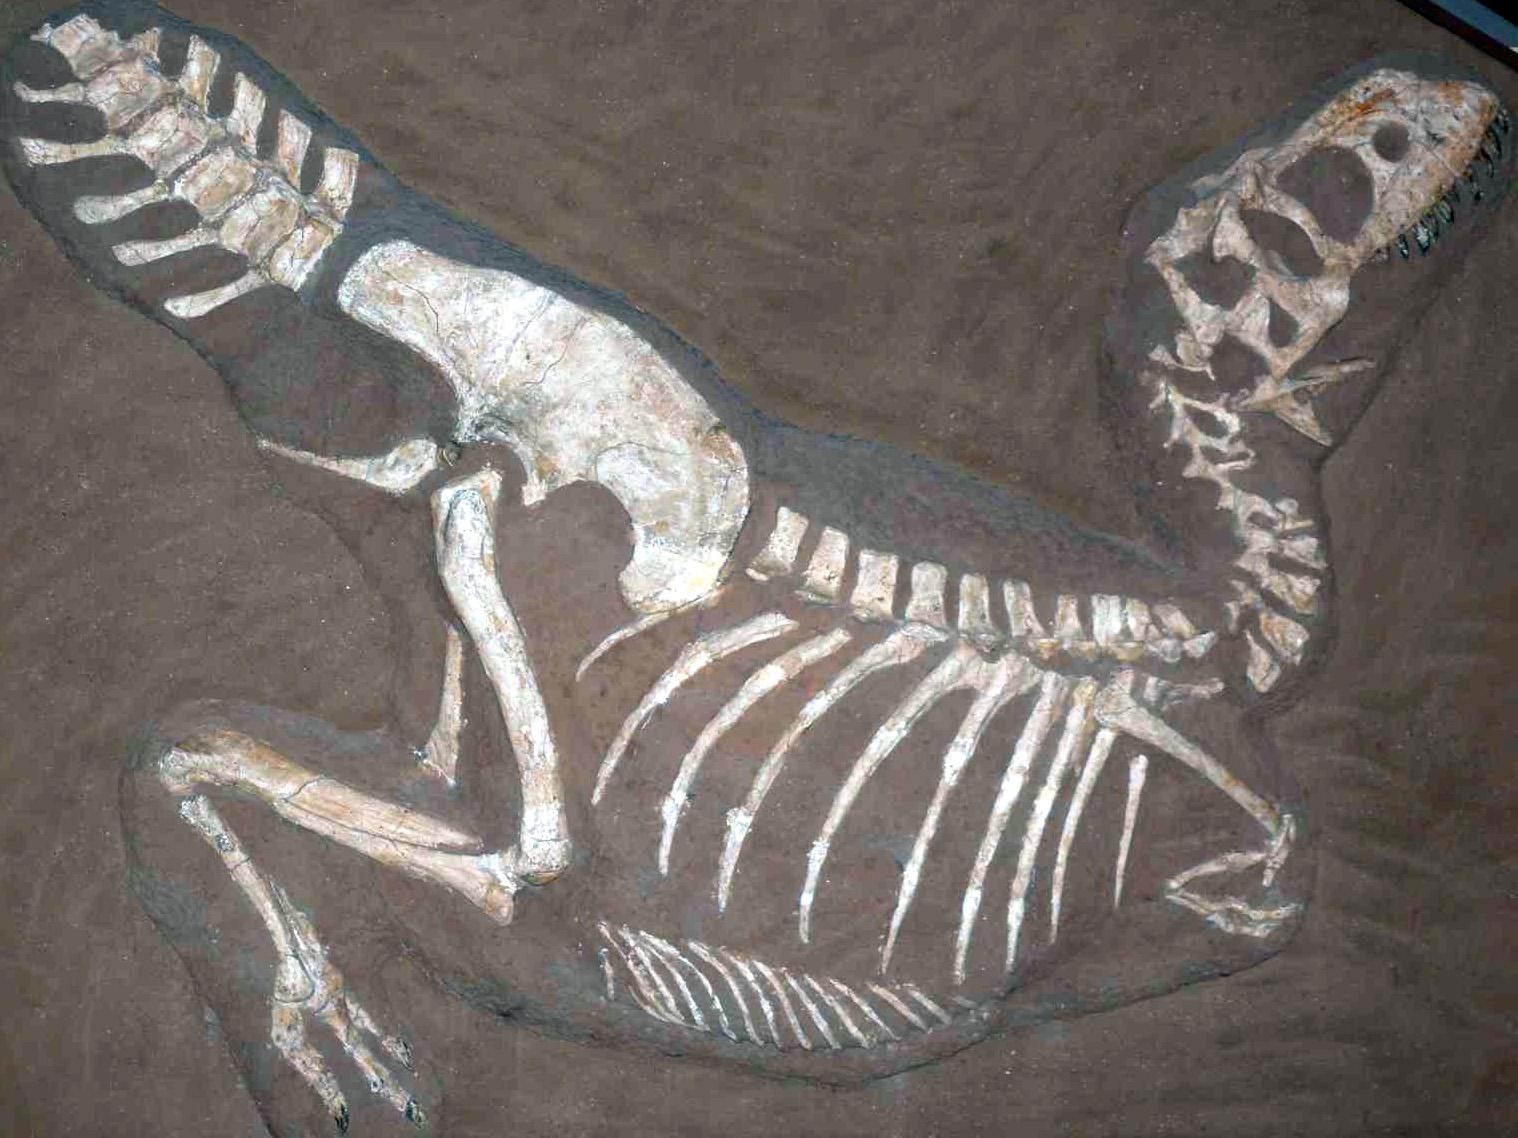 TarbosaurusP1050352.jpg